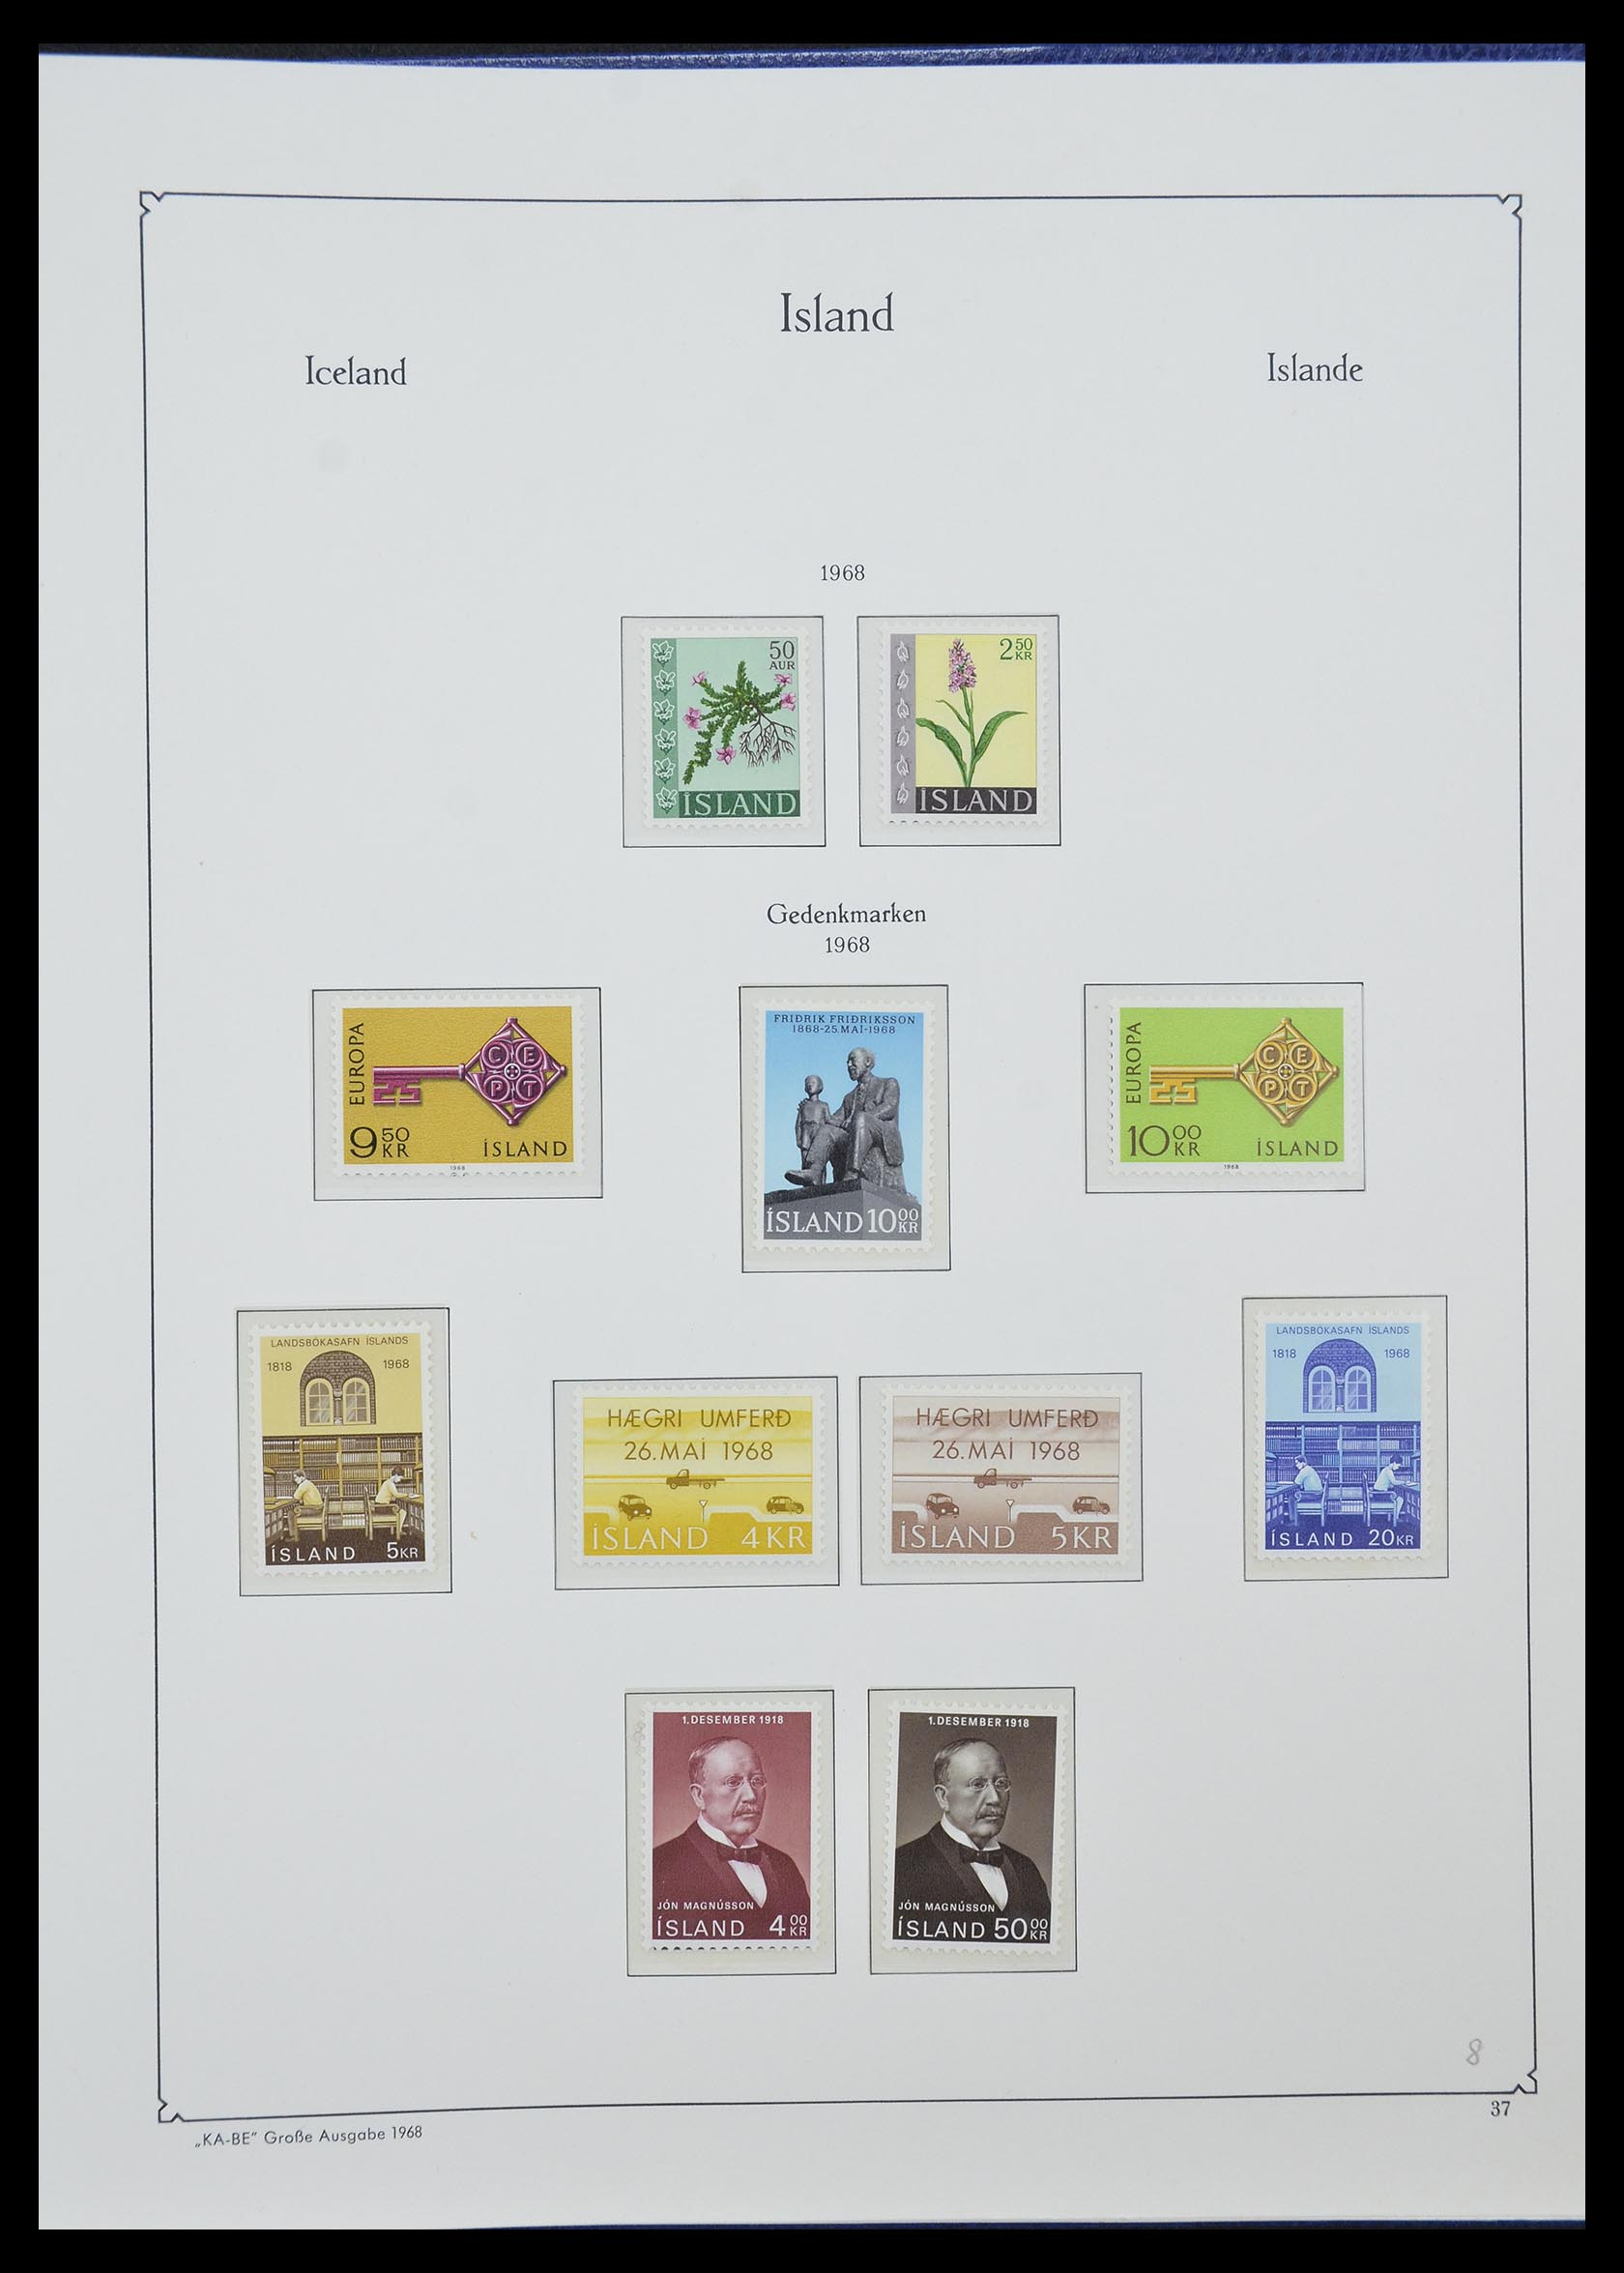 33185 020 - Postzegelverzameling 33184 Finland 1856-1990.